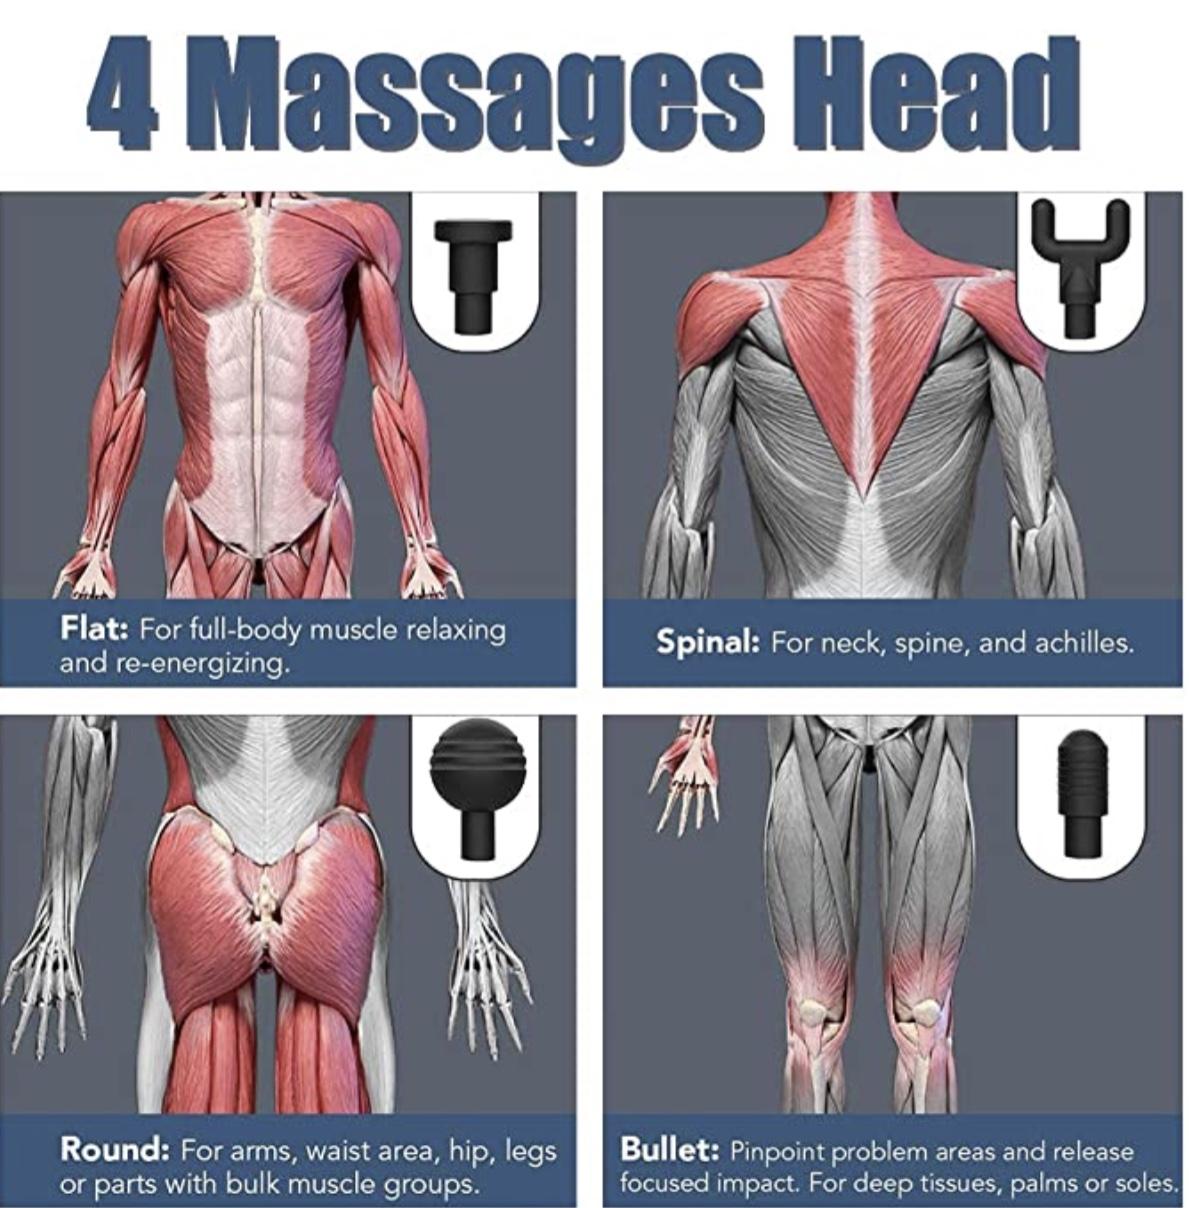 Our Massage Gun Uses An Ergonomically Designed Handle To Minimize External Vibrations